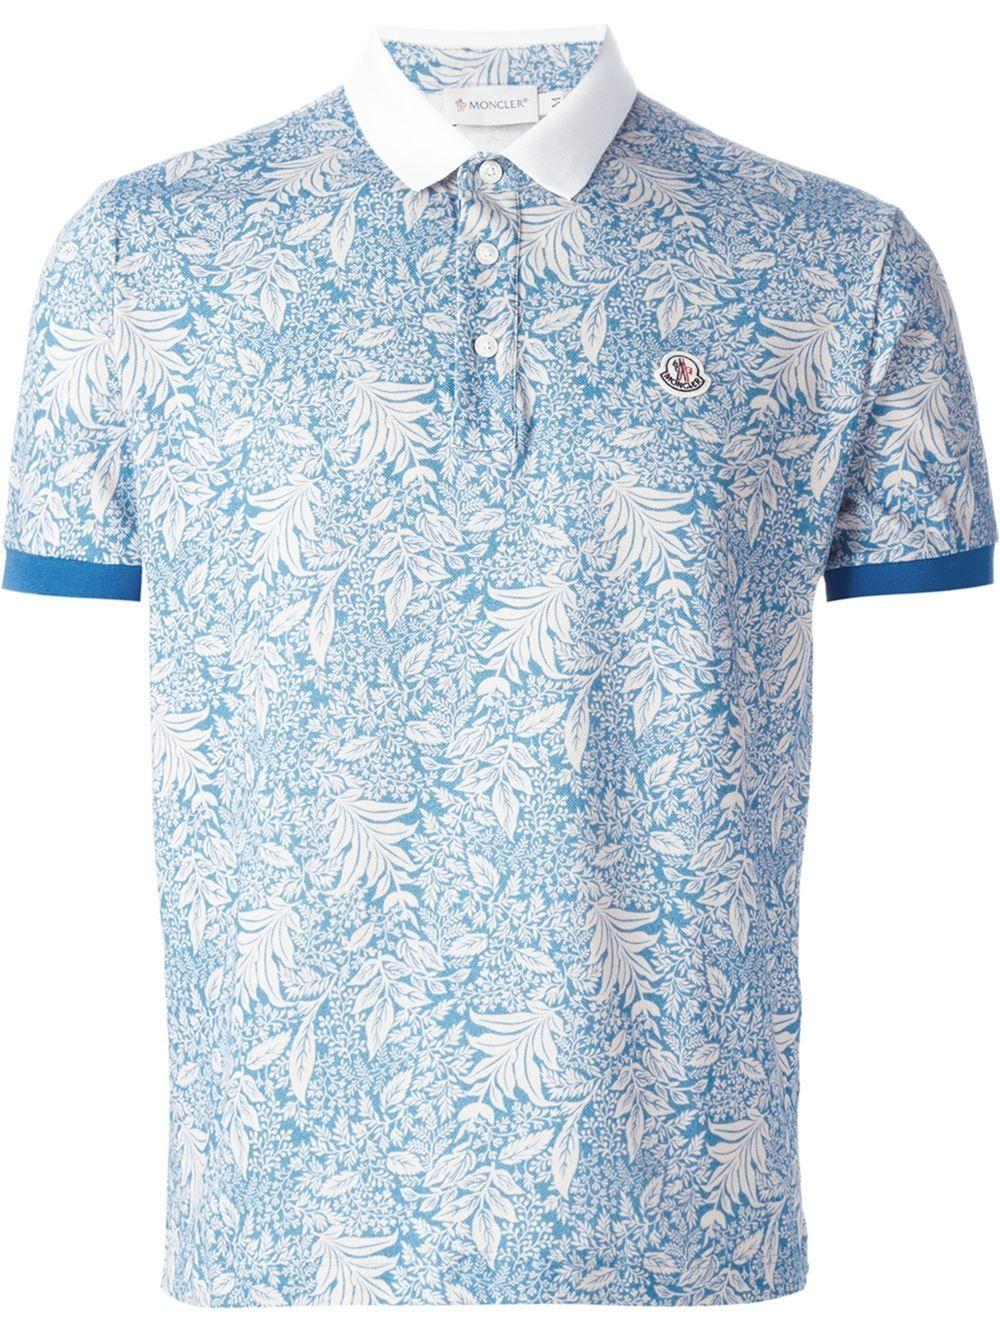 free shipping 5a6d8 4c7e9 Moncler Poloshirt Mit Floralem Print - - Farfetch.com ...